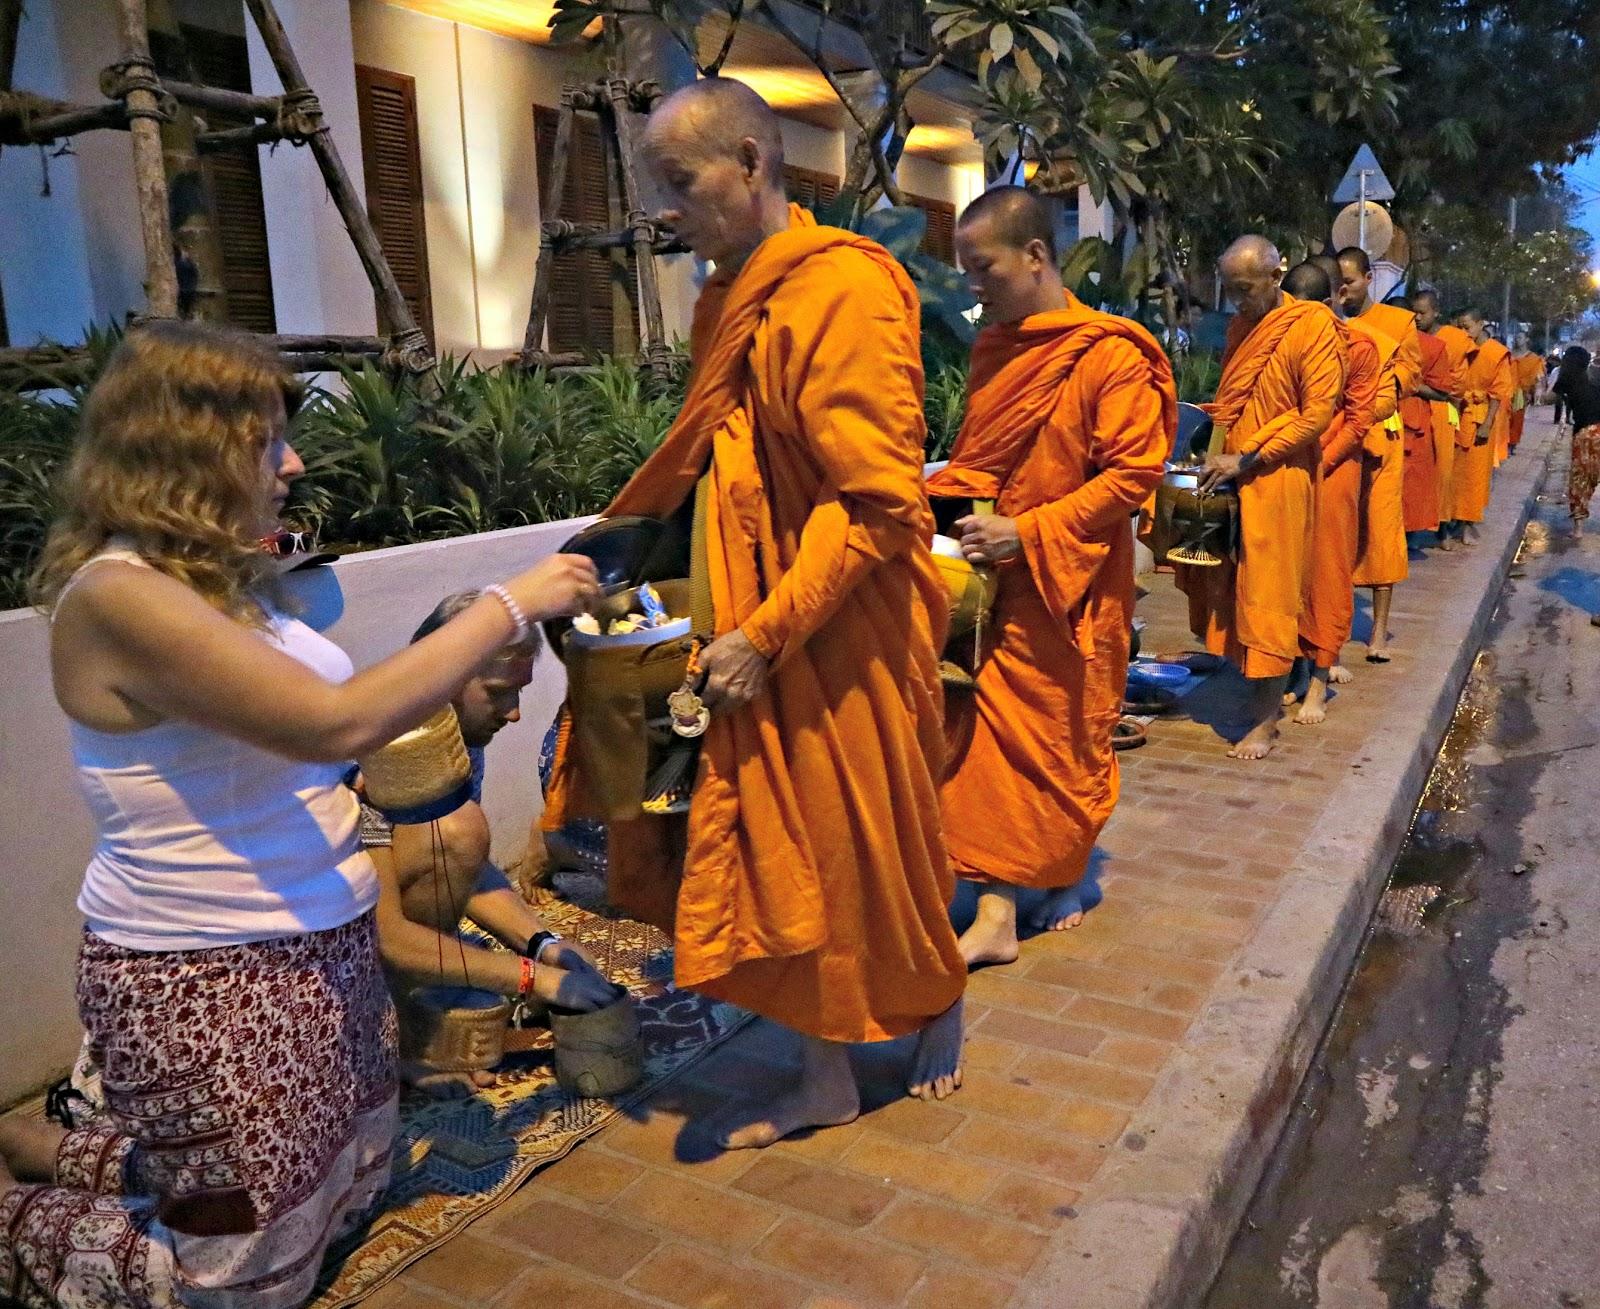 Luang Prabang, Laos - Alms Giving Ceremony